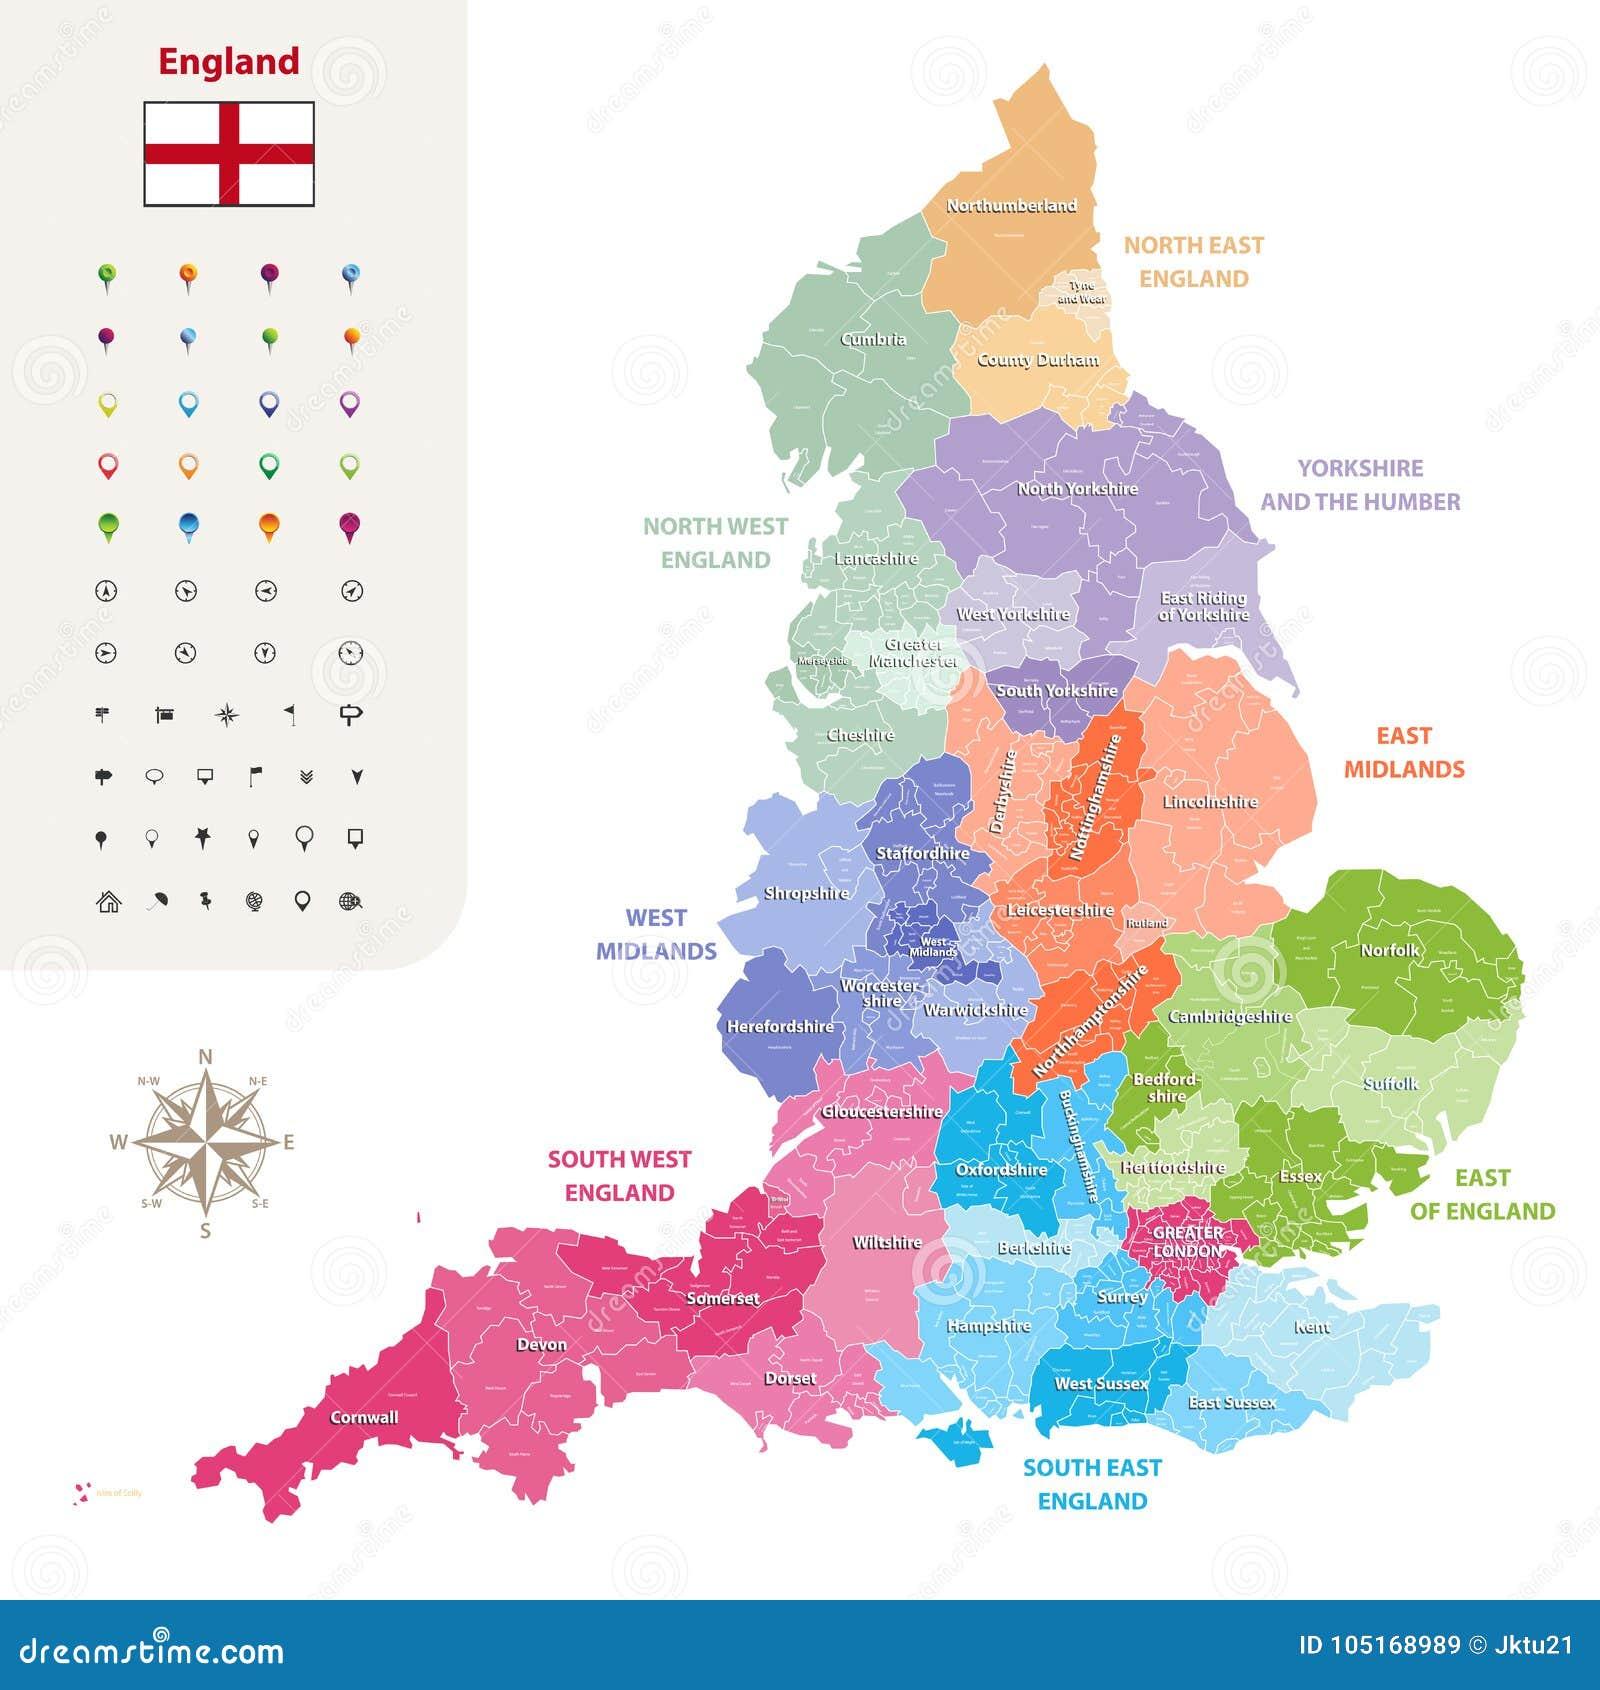 Carte Angleterre Region.Les Comtes Ceremonieux De L Angleterre Dirigent La Carte